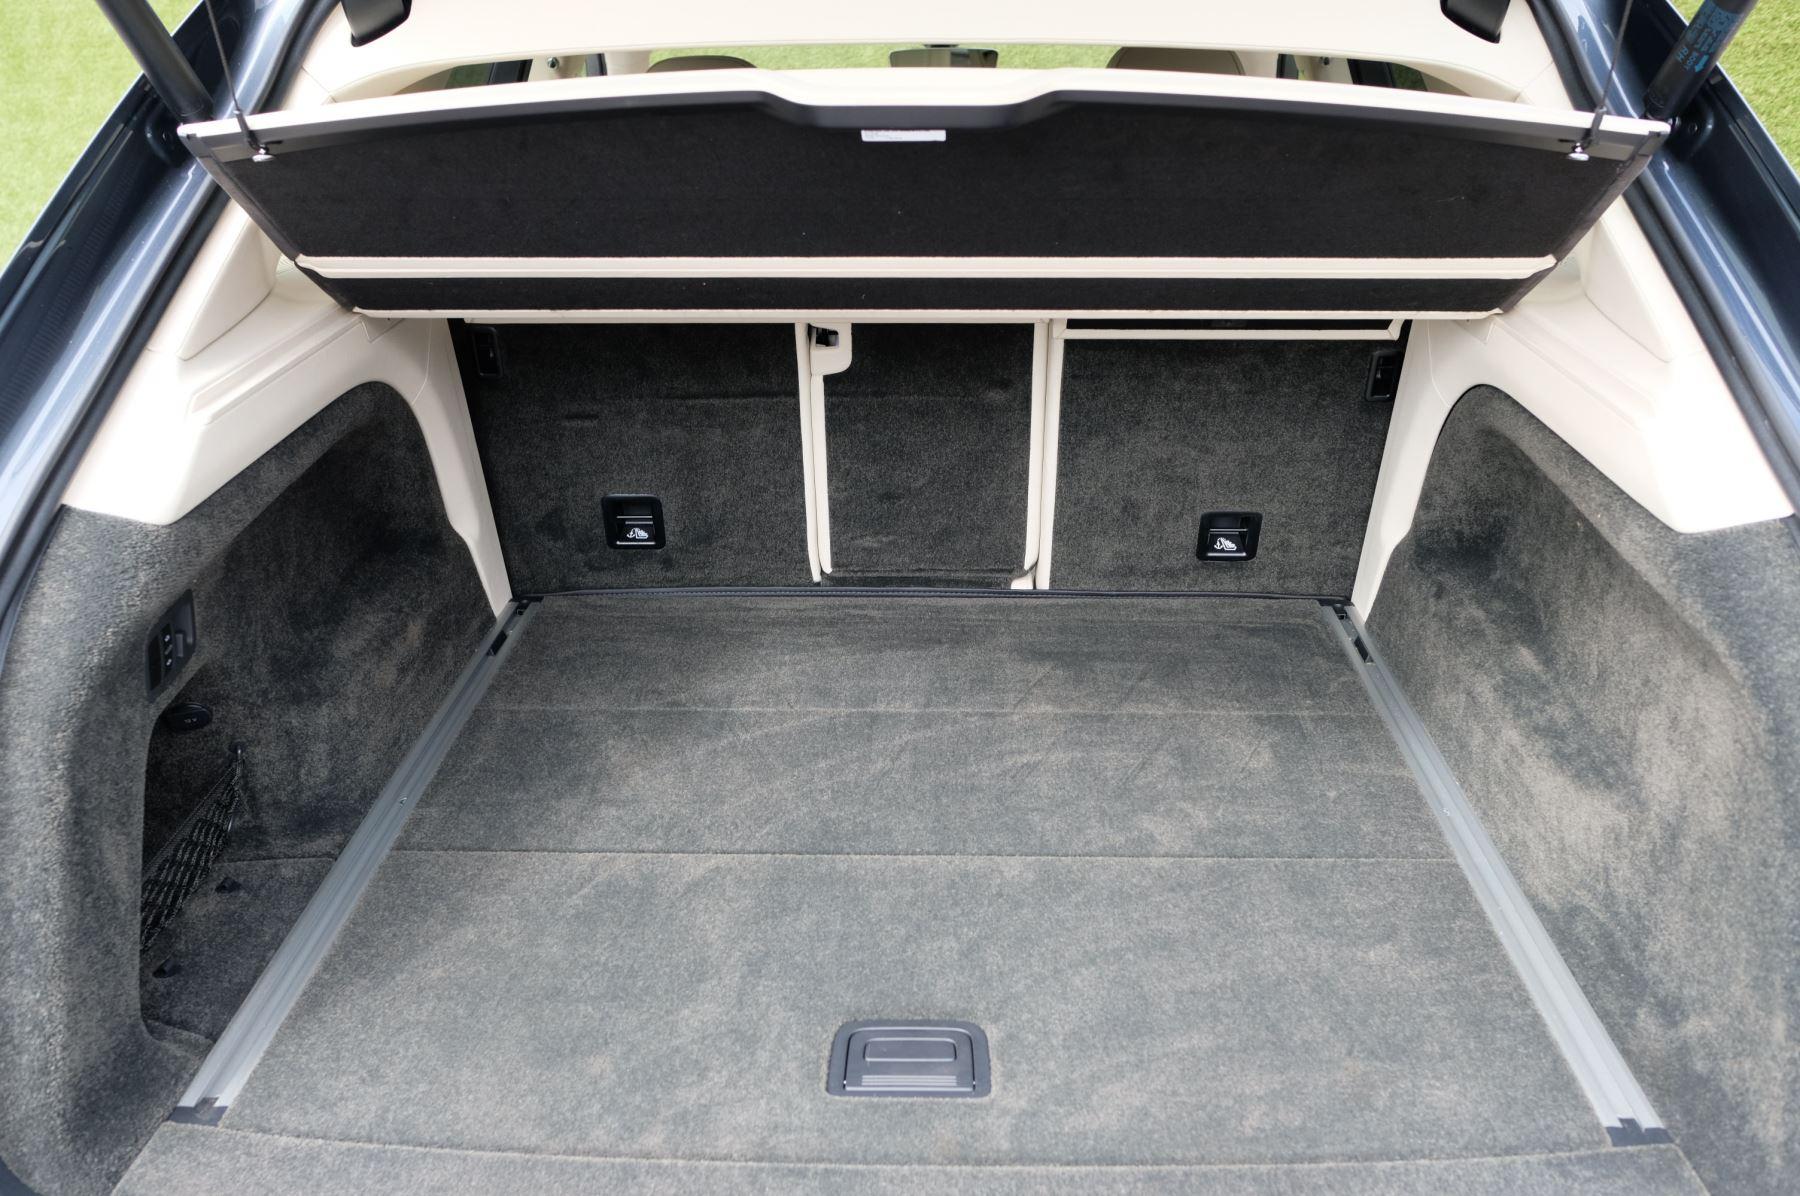 Bentley Bentayga 4.0 V8 5dr - Mulliner Driving Specification - City & Tour Specification image 19